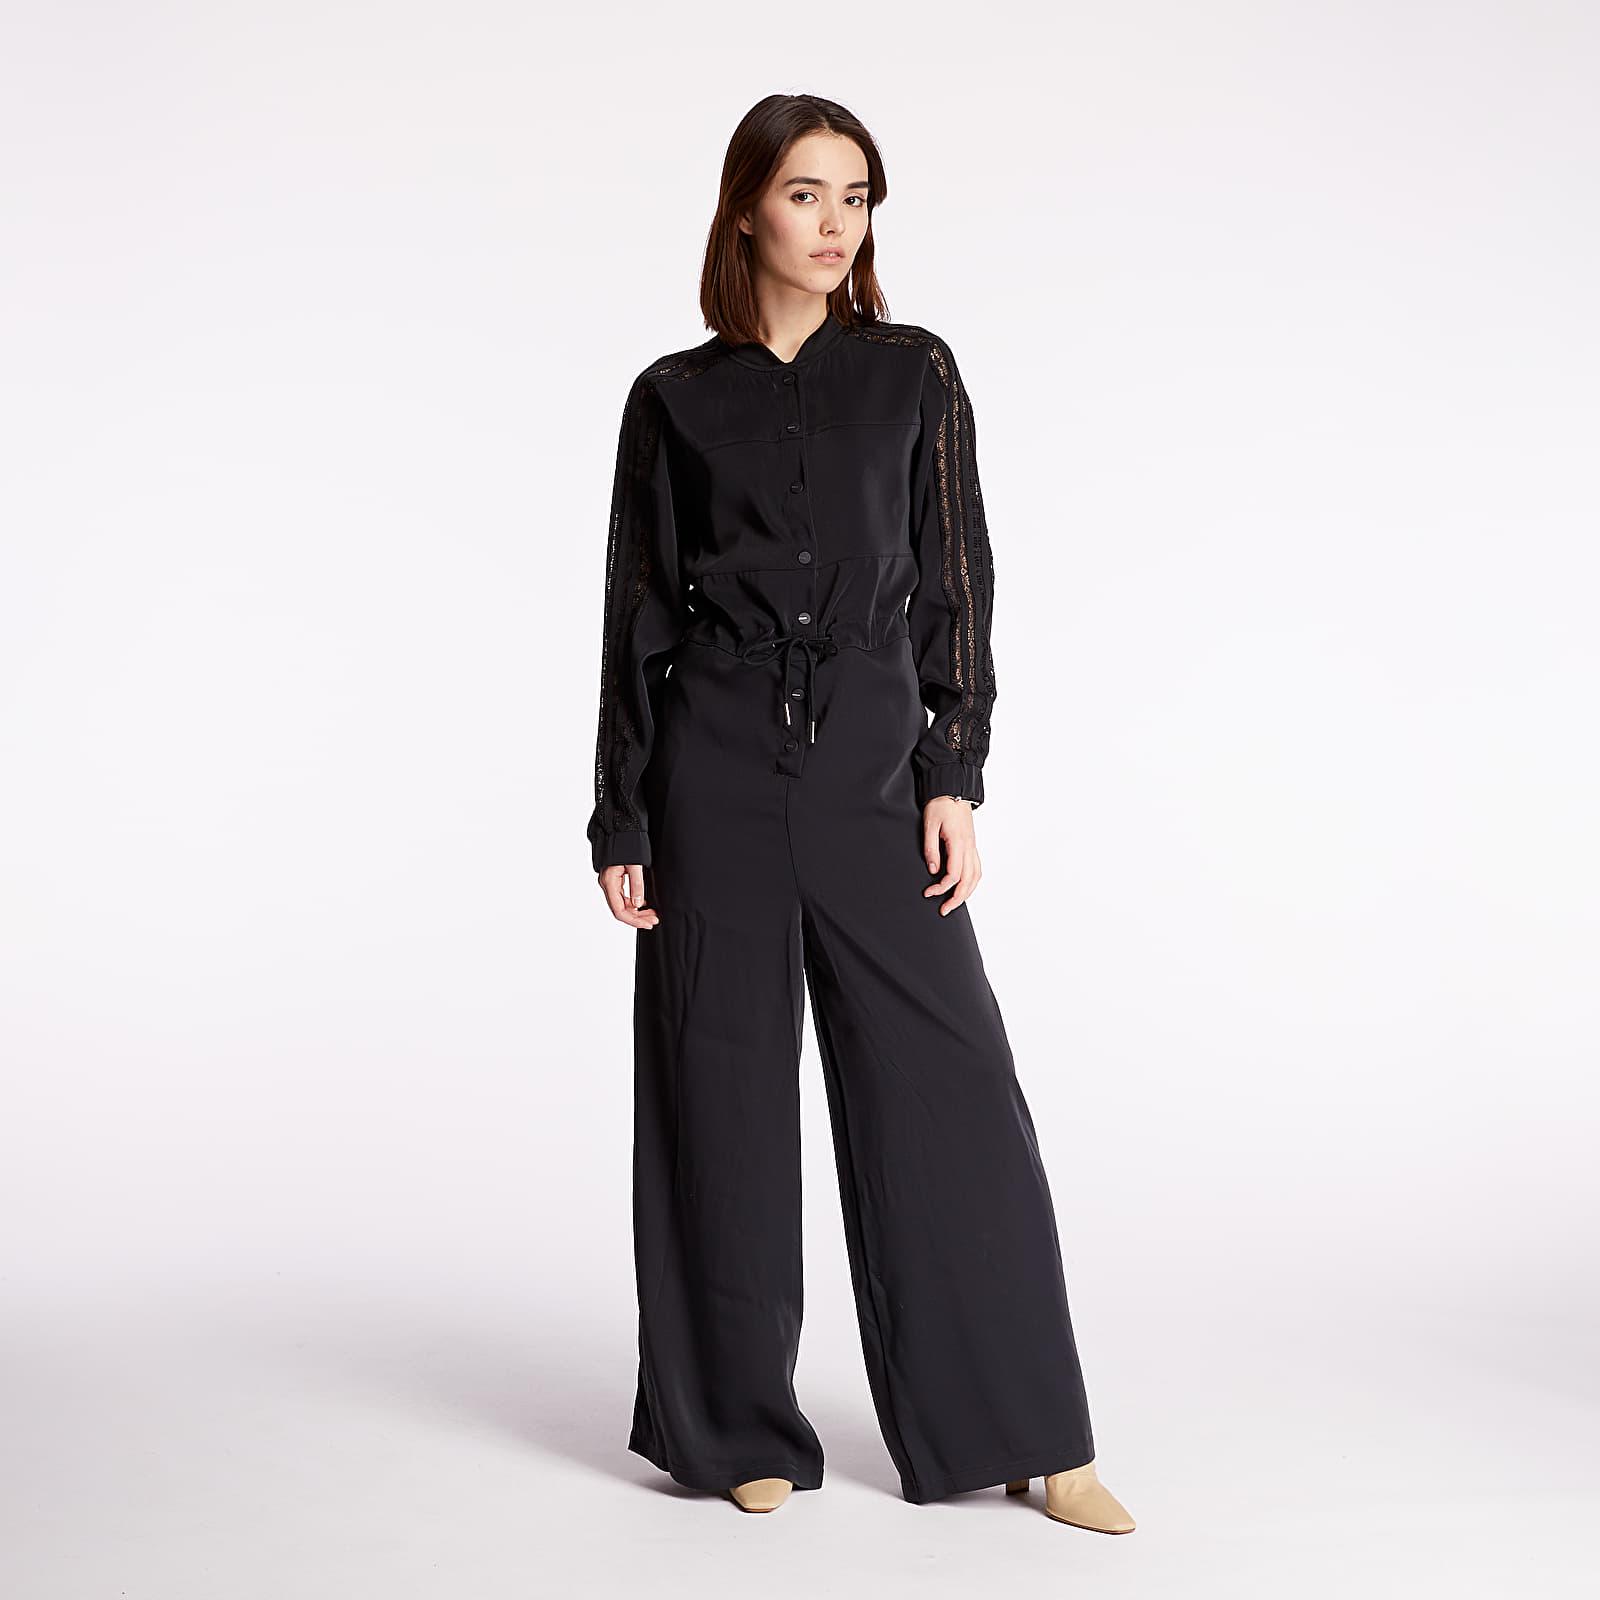 Damen Bekleidung adidas Lace Jumpsuit Black